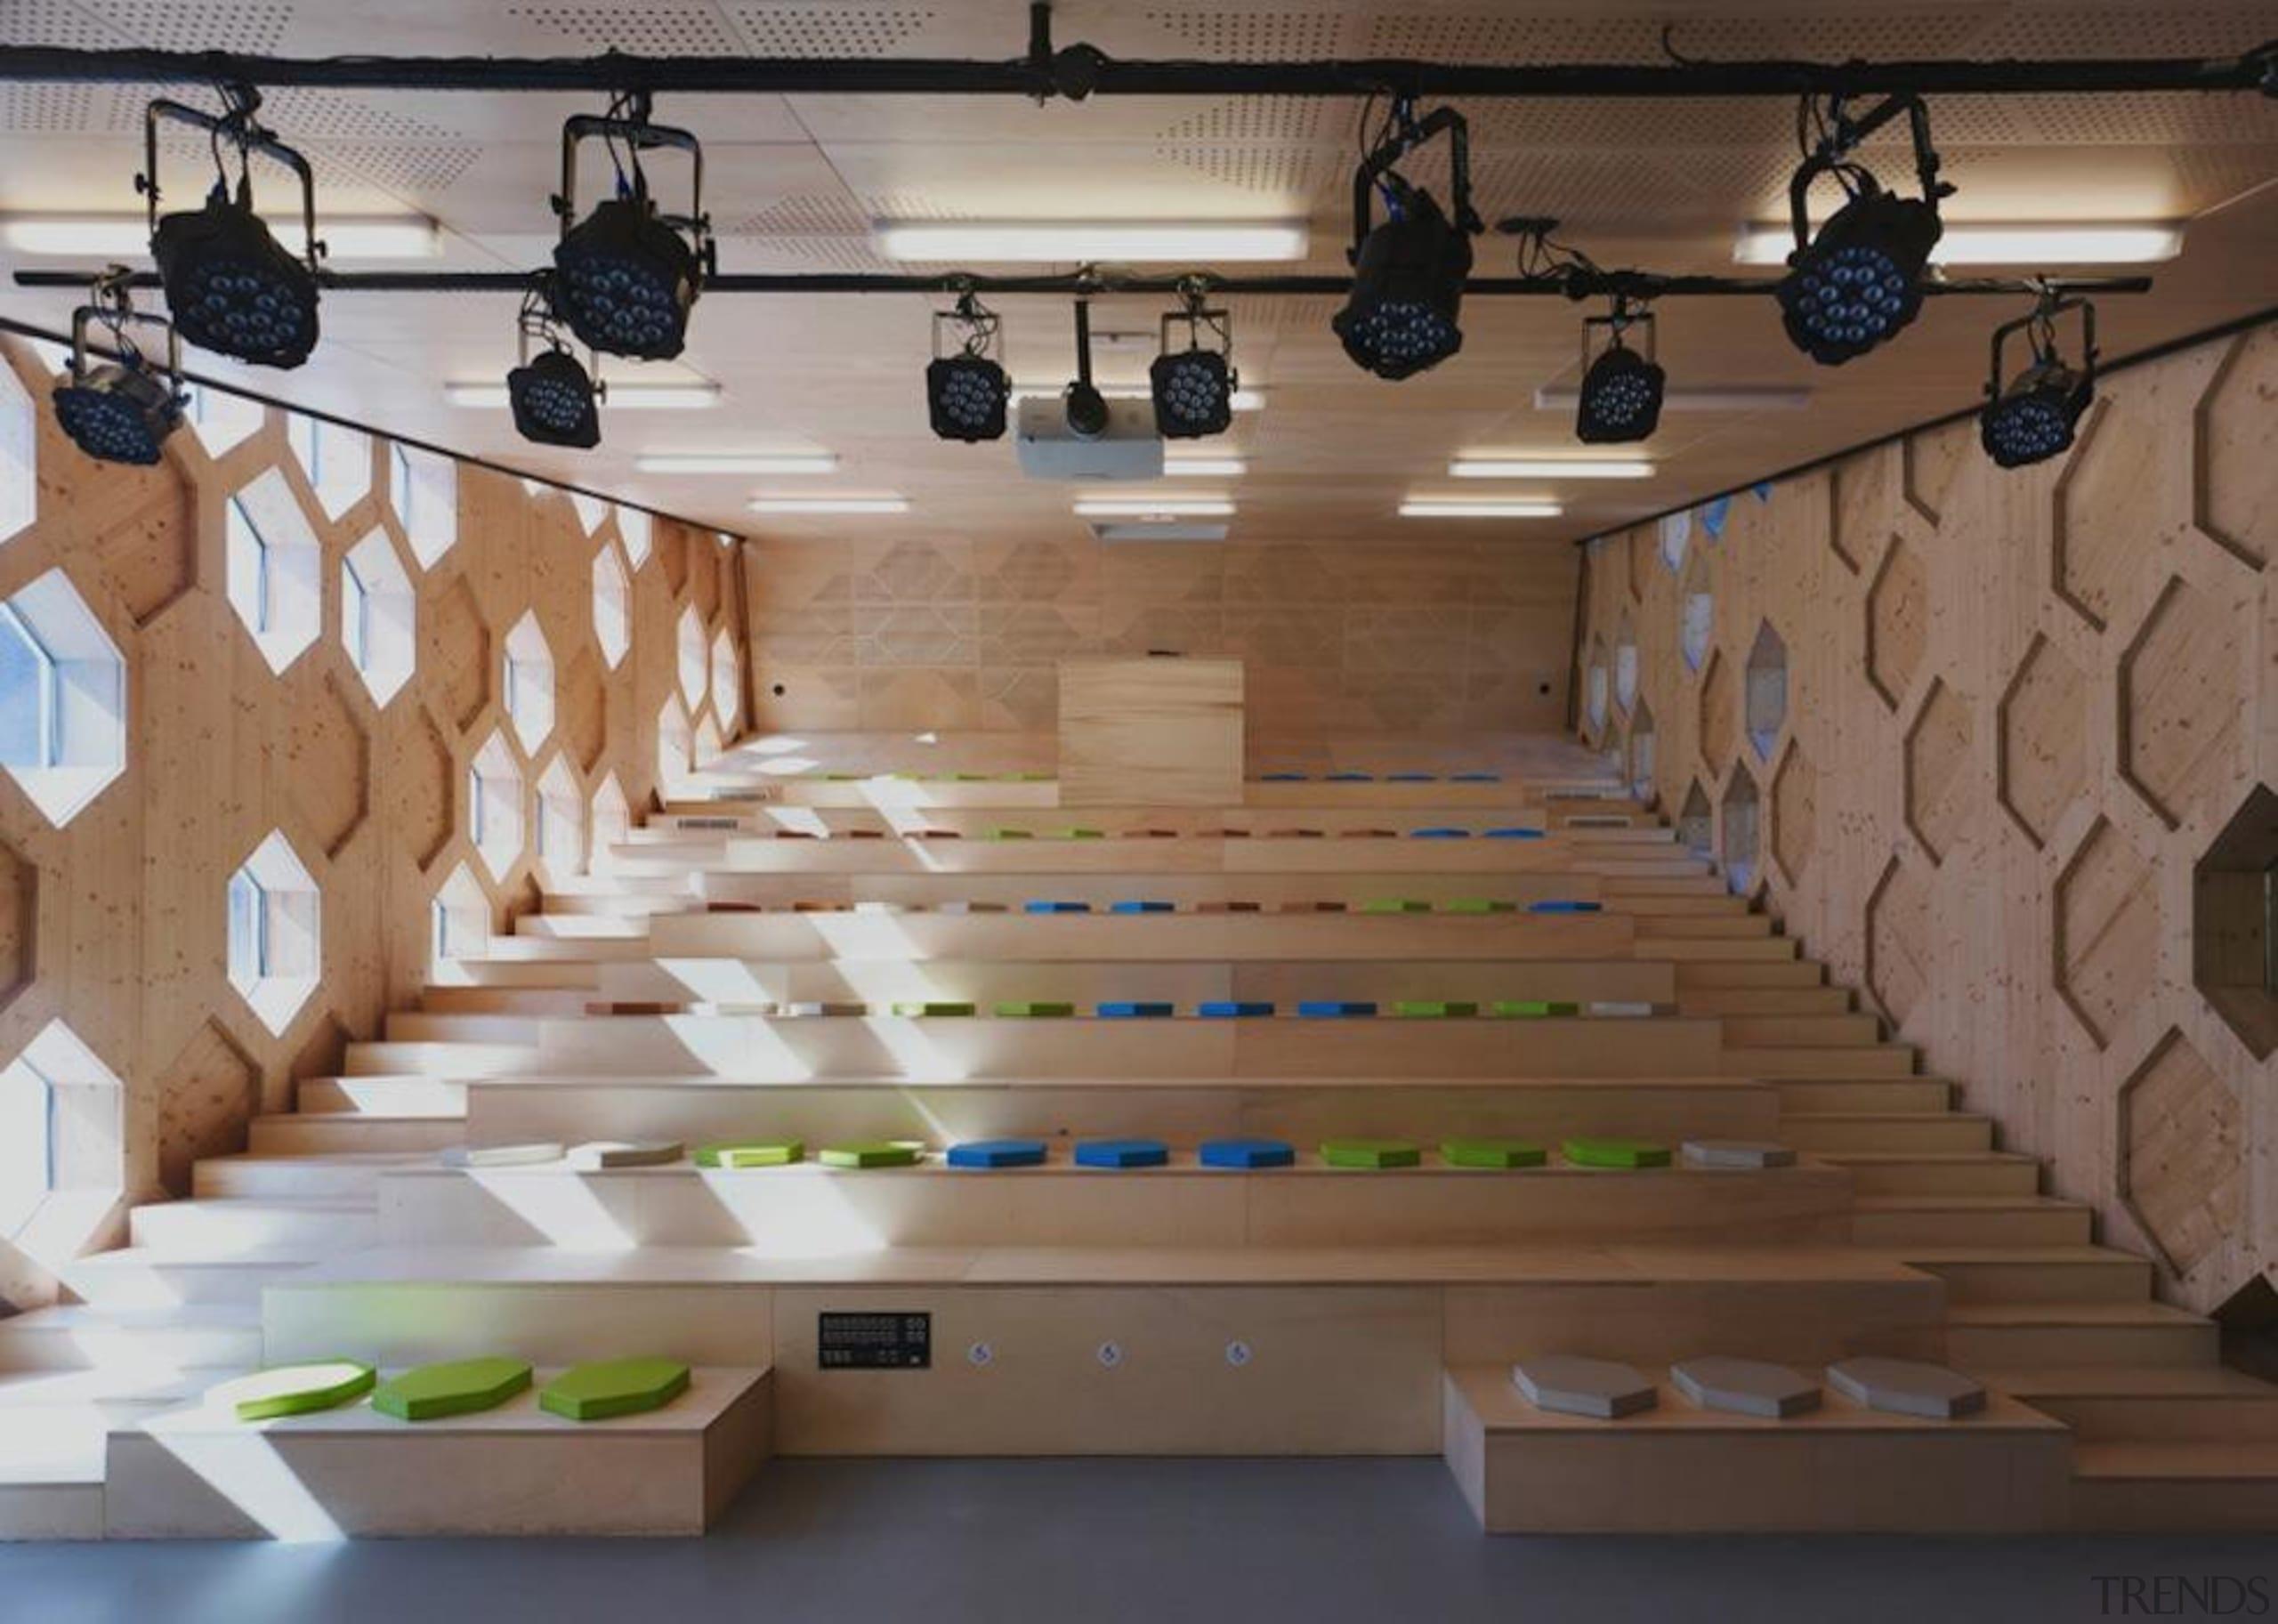 Library Extension - Library Extension - floor   floor, flooring, furniture, interior design, table, wall, wood, brown, gray